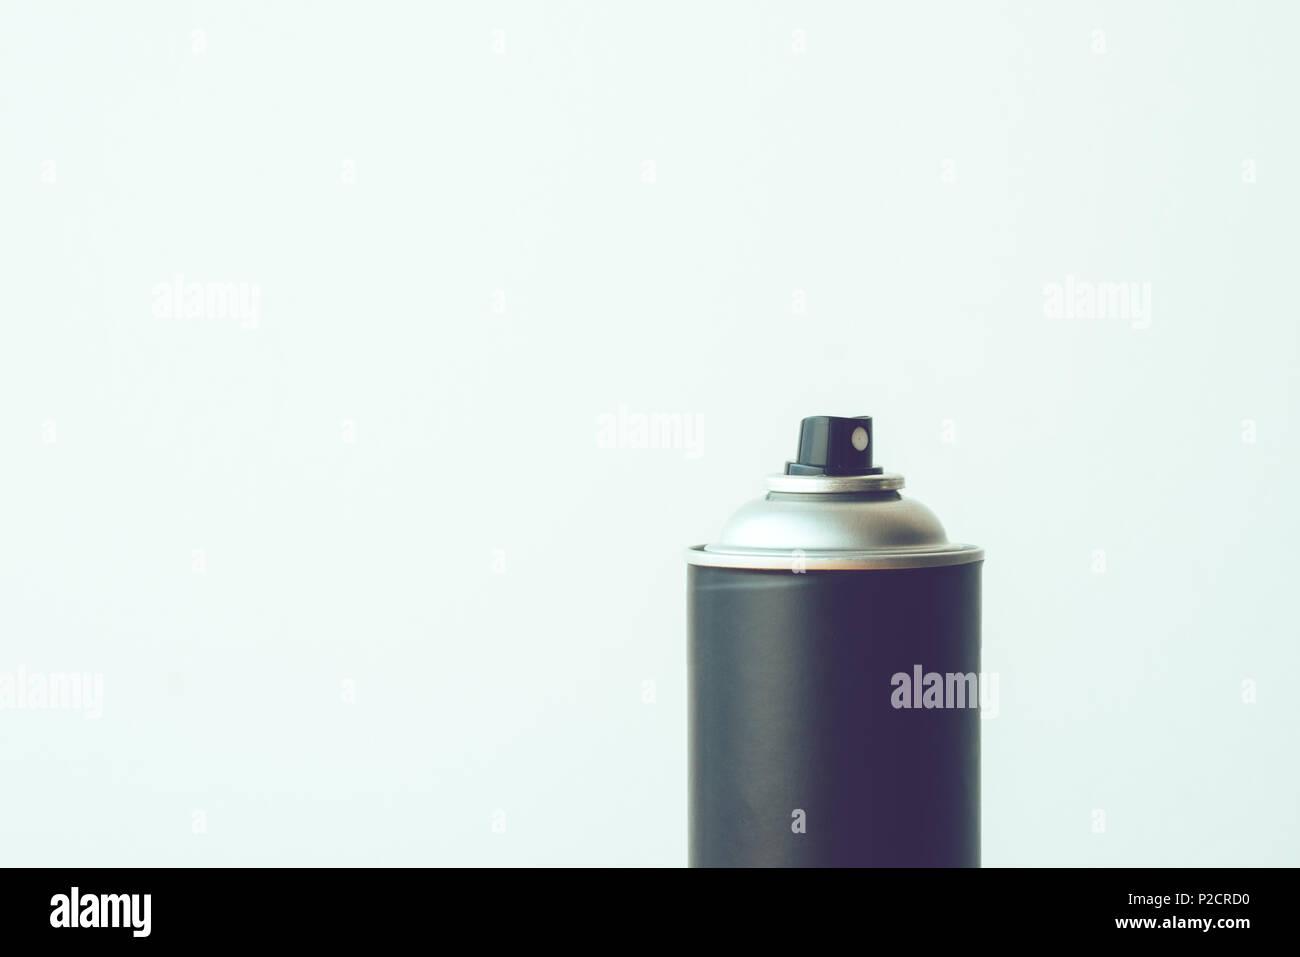 Color Spray Can For Graffiti Artwork With Copy Space Photo By Stevanovicigor